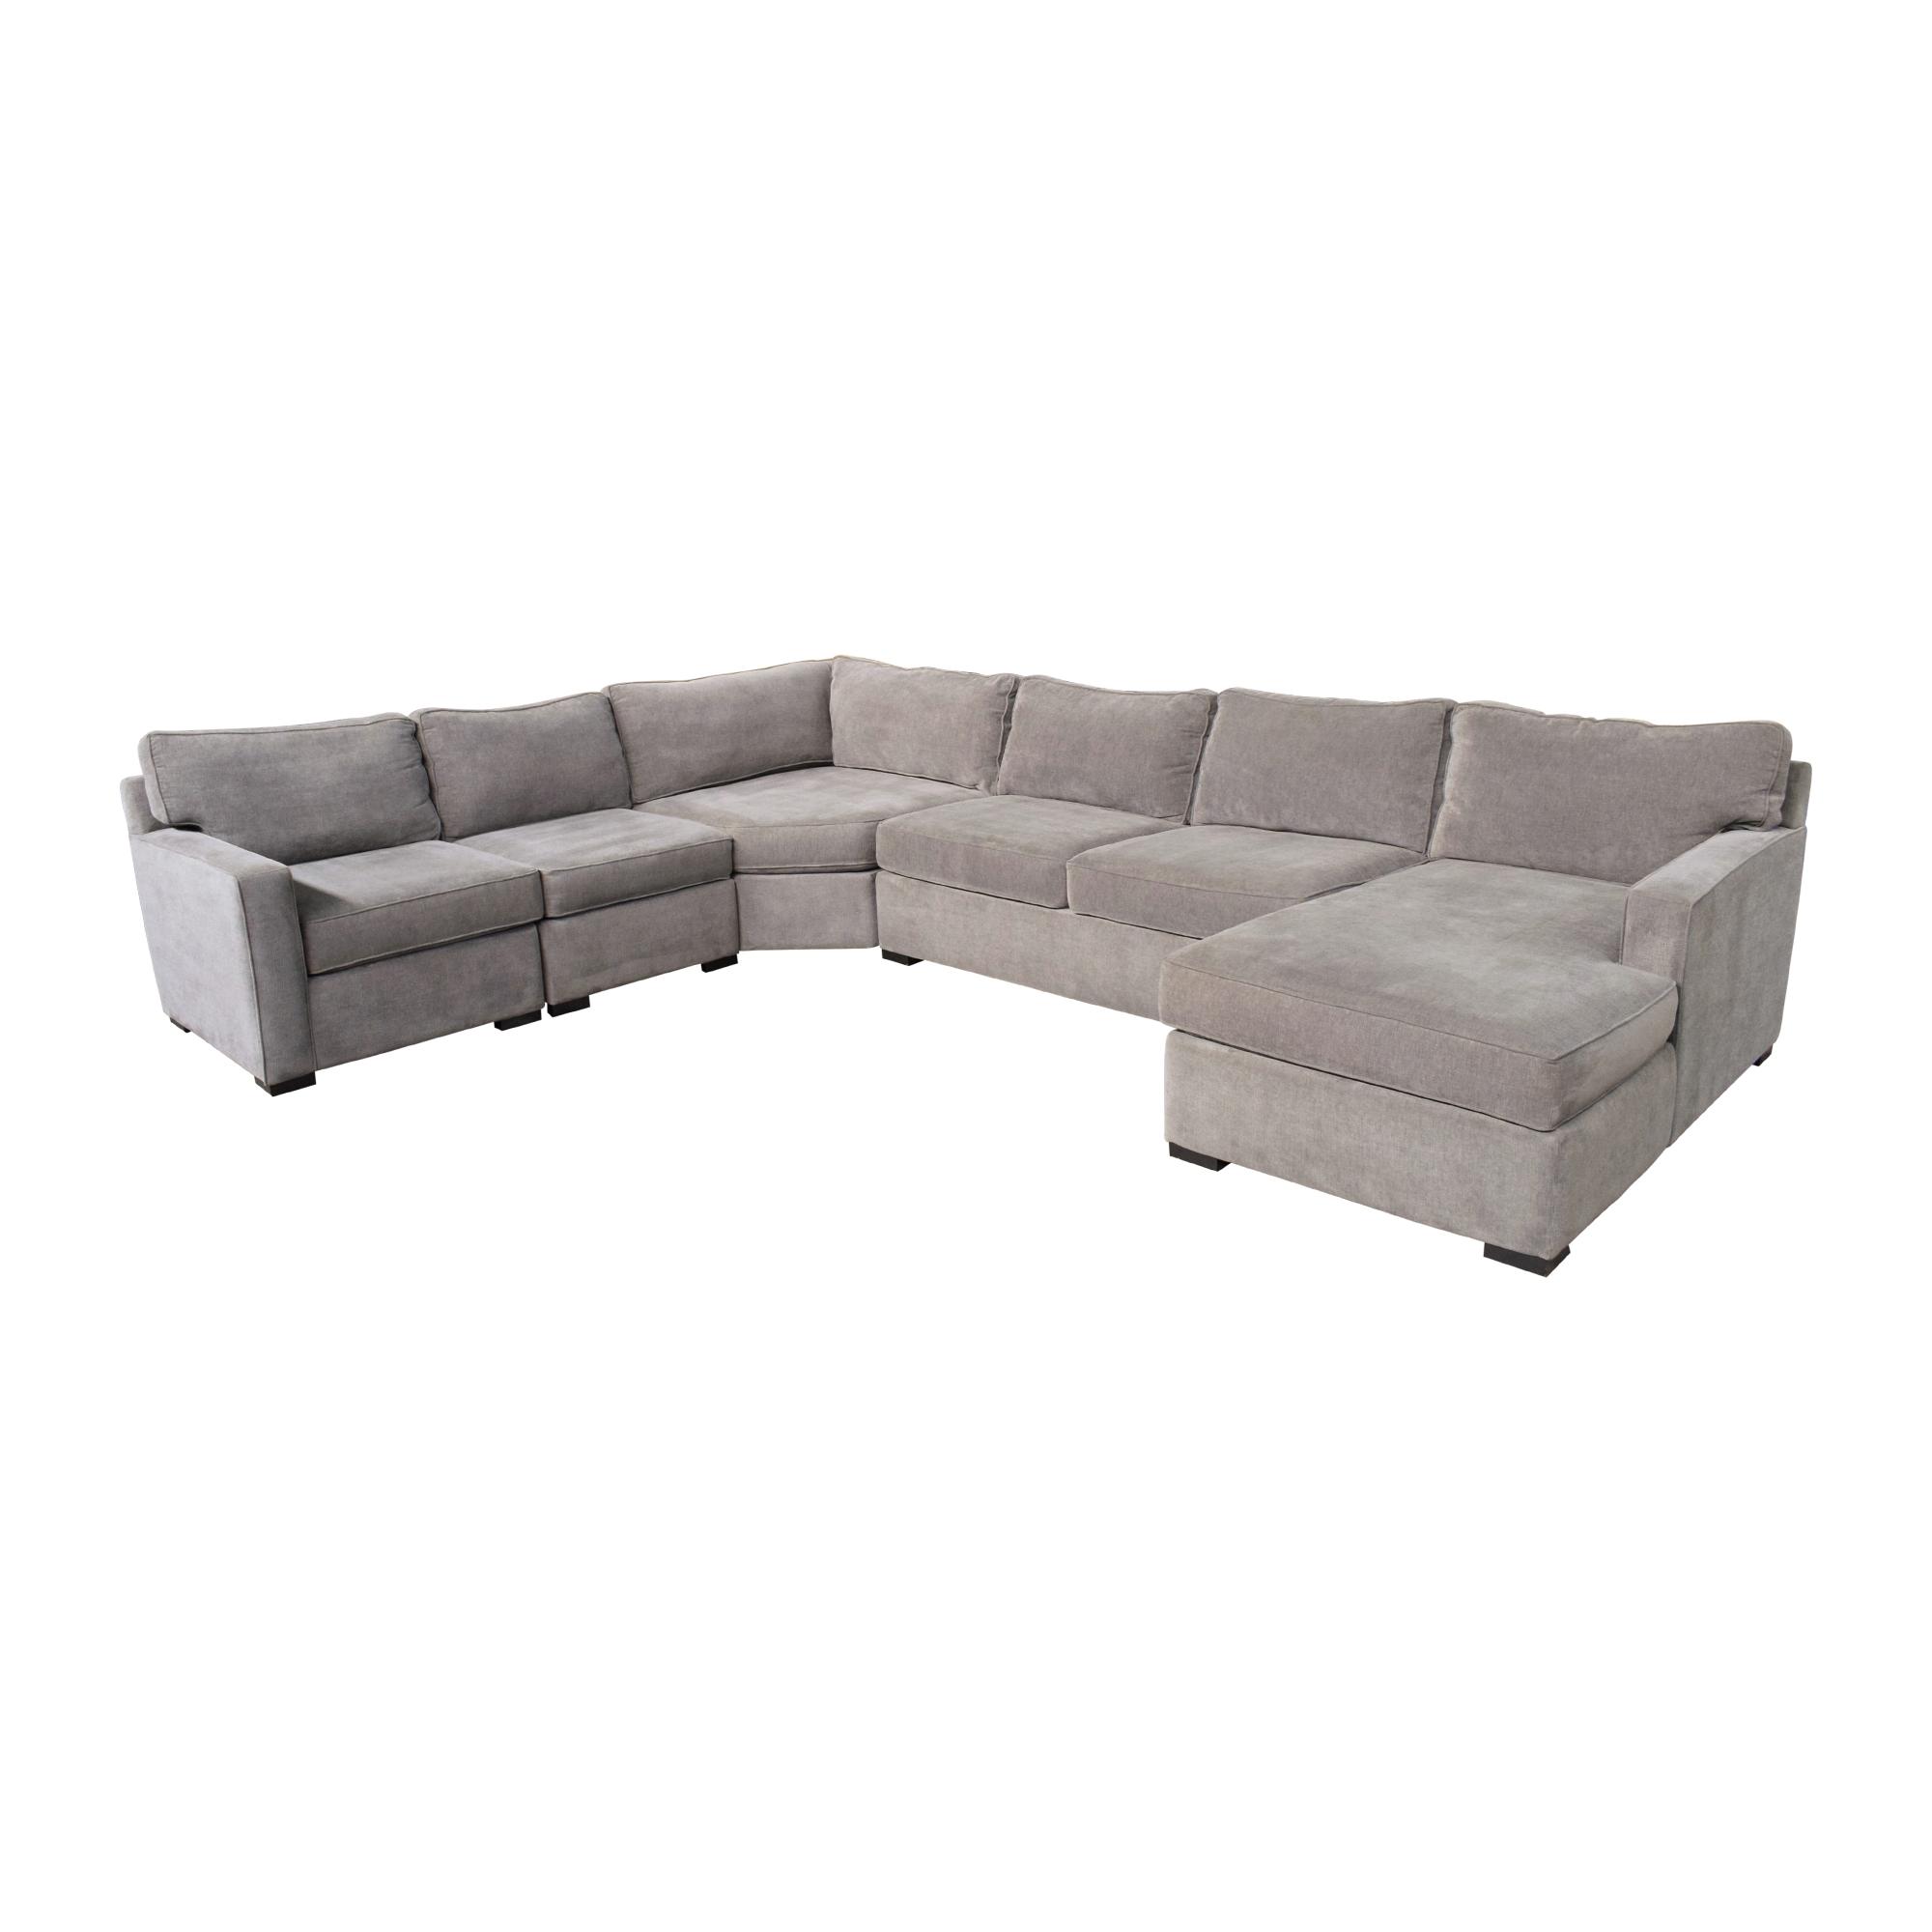 Macy's U-Shaped Chaise Sectional Sofa / Sofas